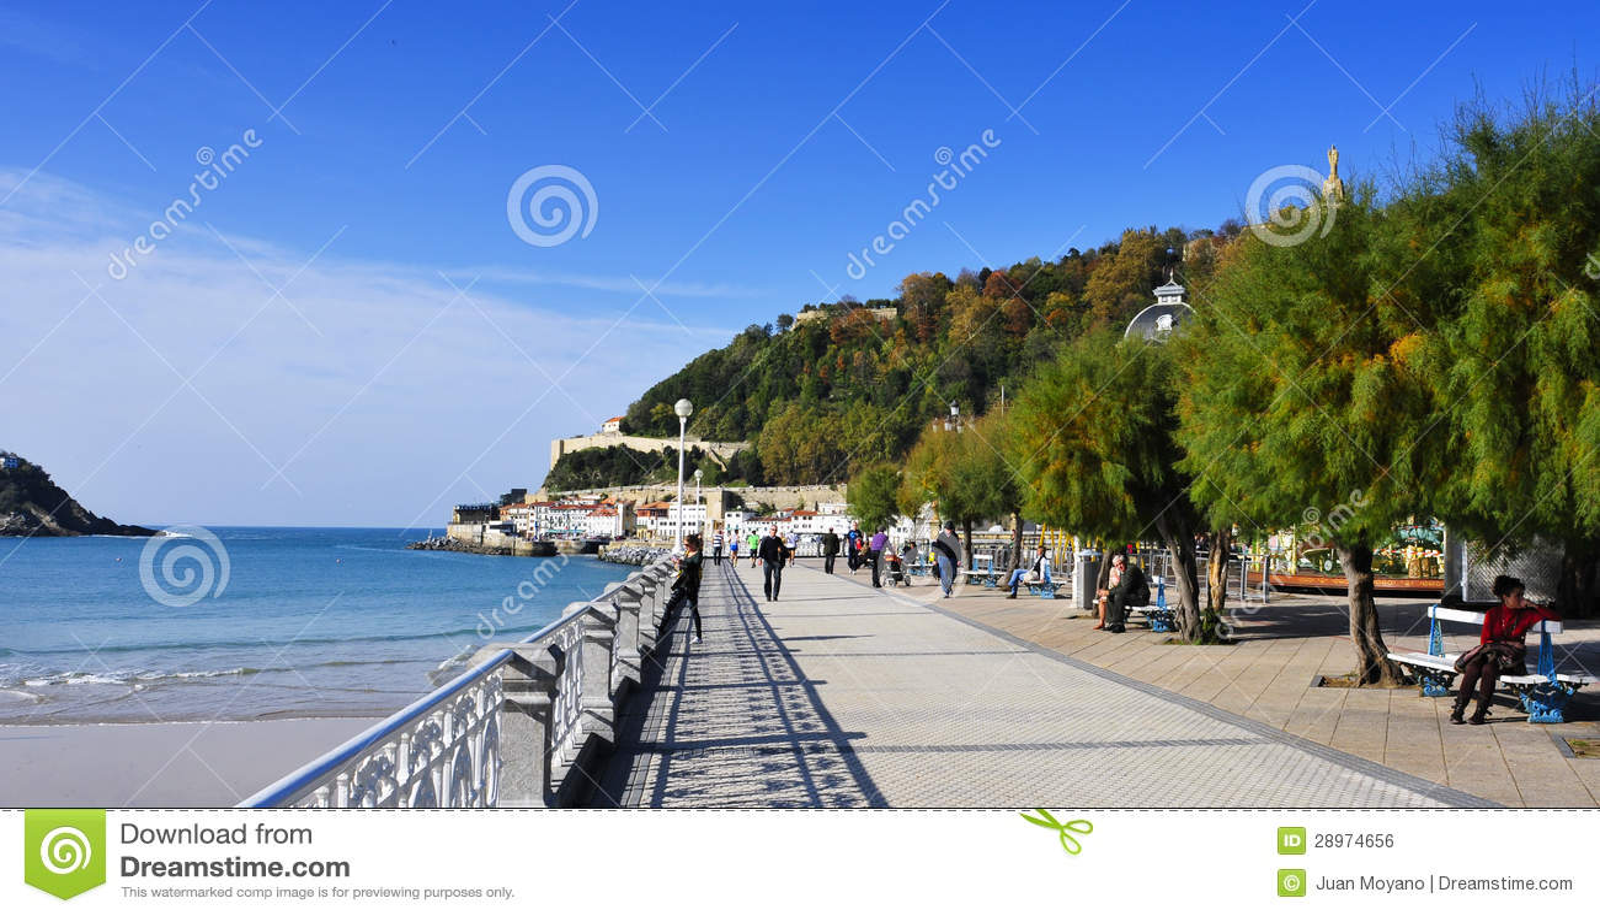 Losu Angeles Concha plaża w San Sebastian, Hiszpania